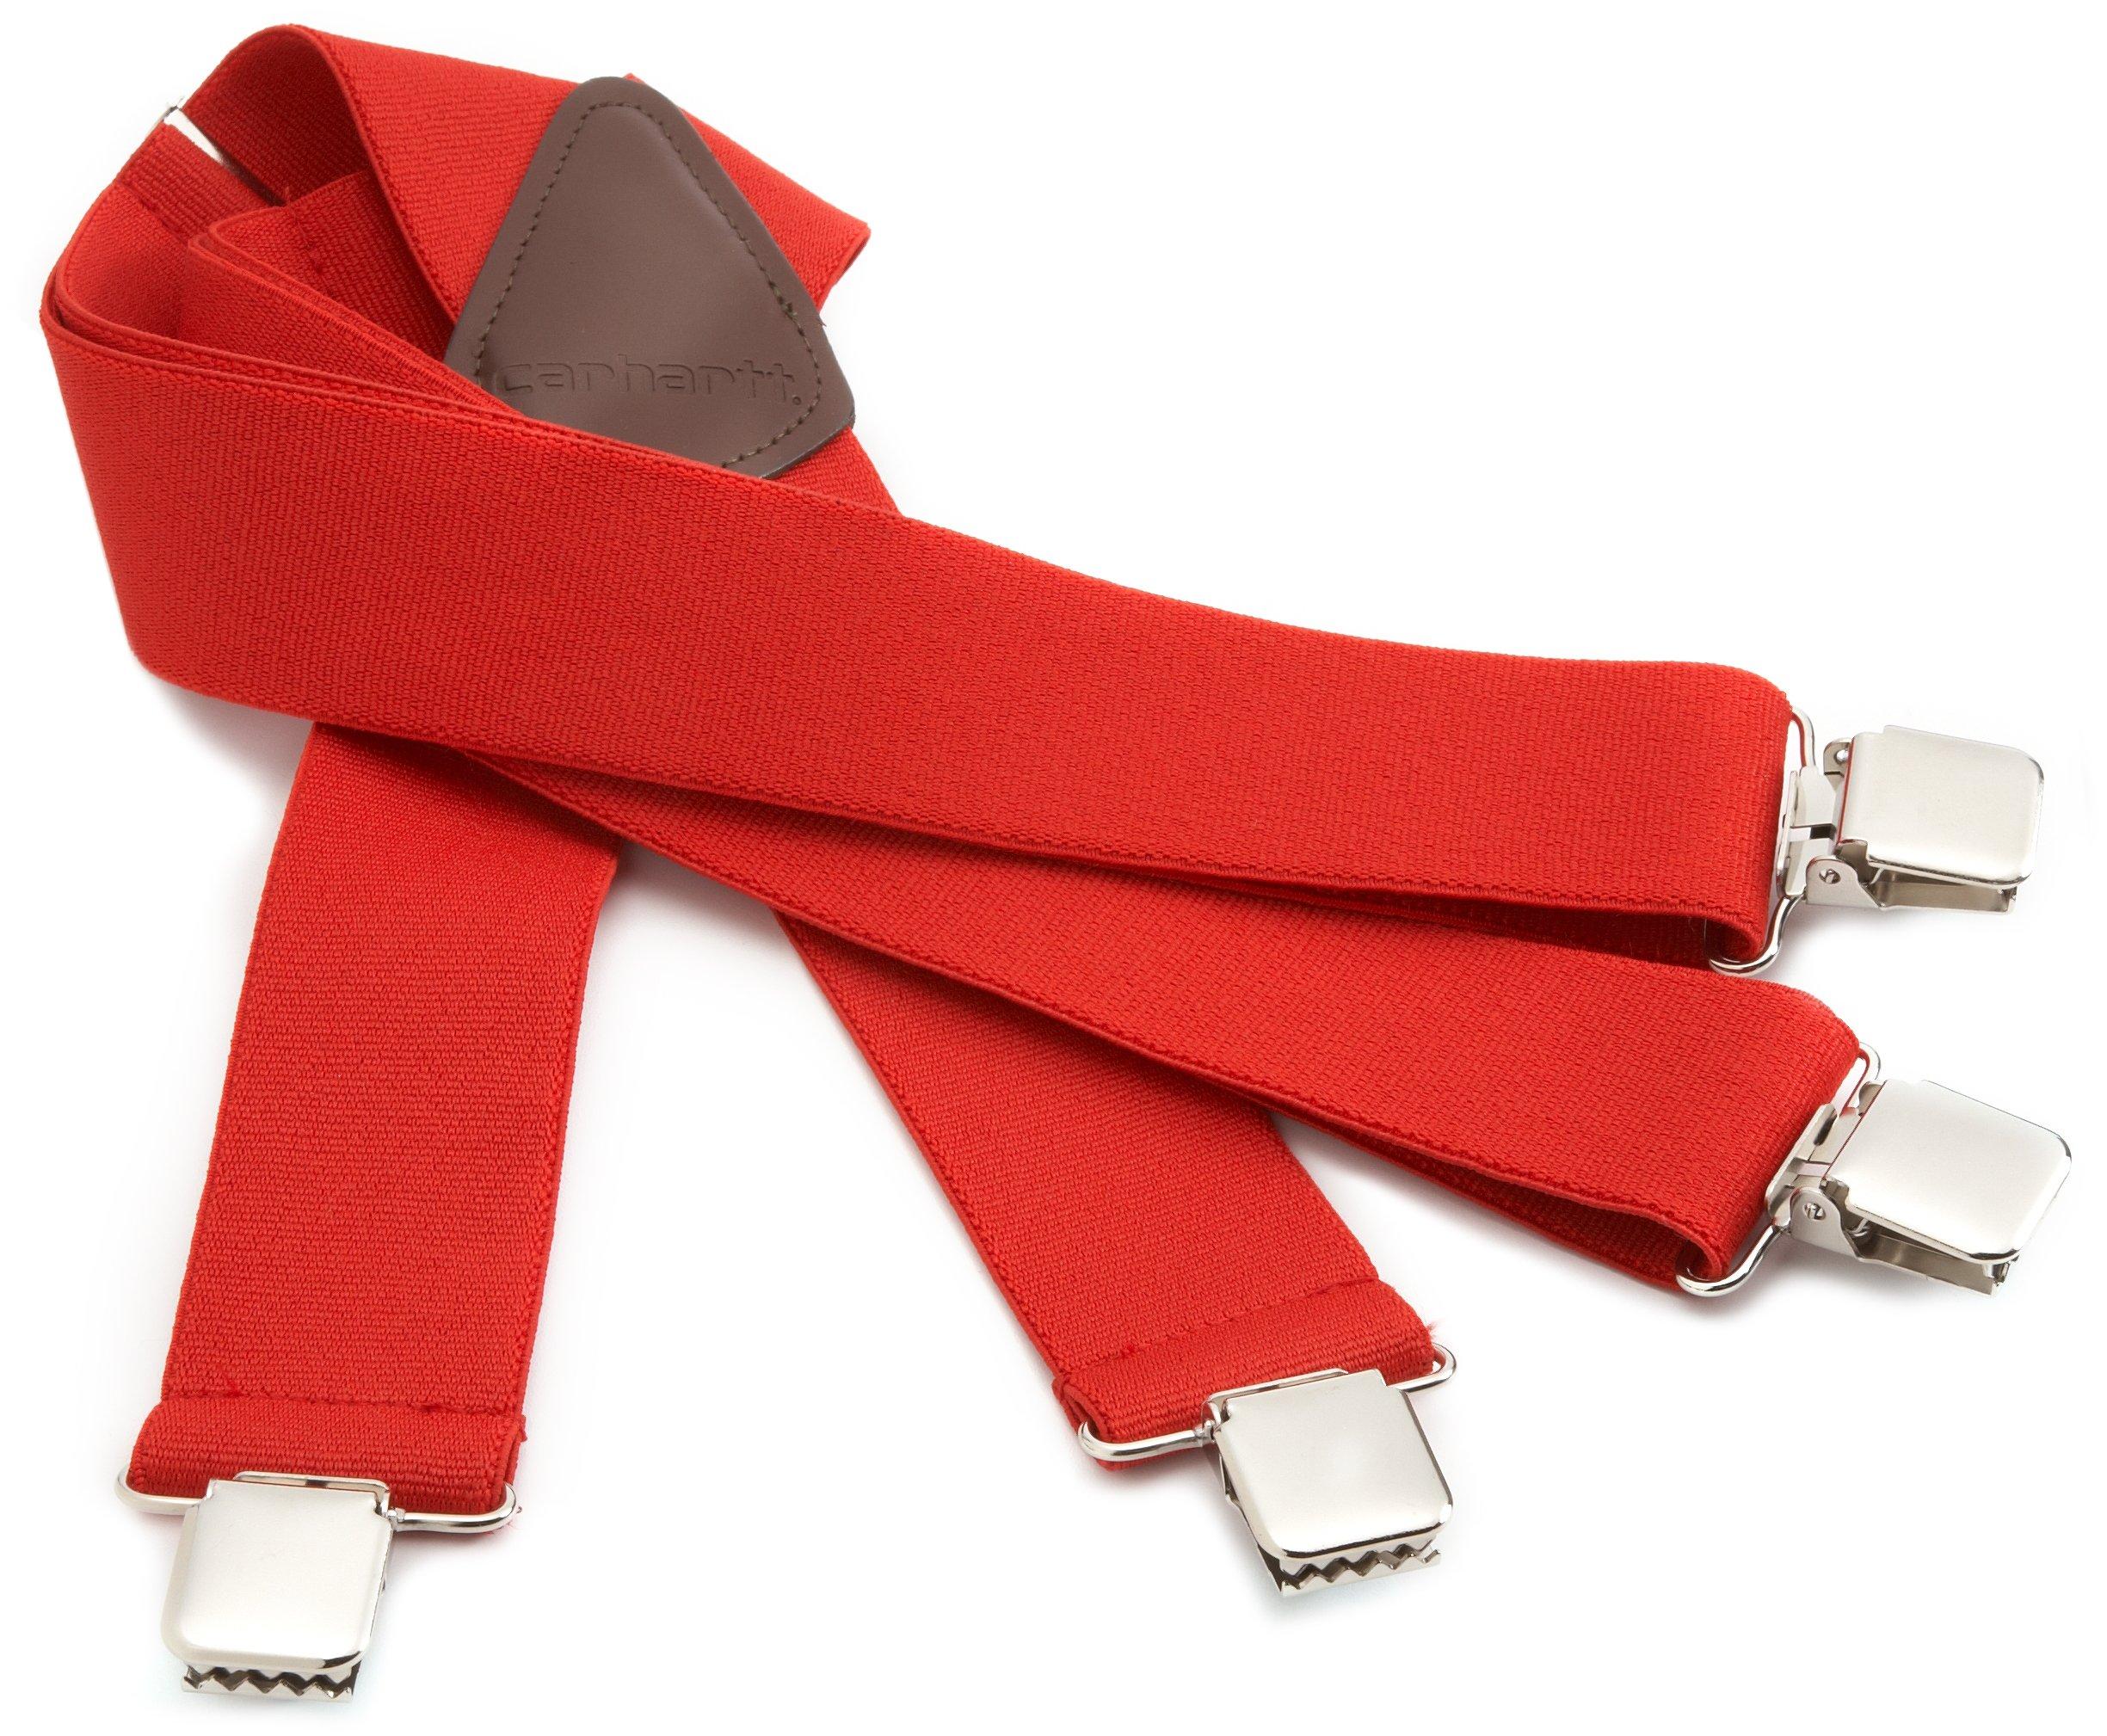 Carhartt Men's Utility Suspender,Red,One Size